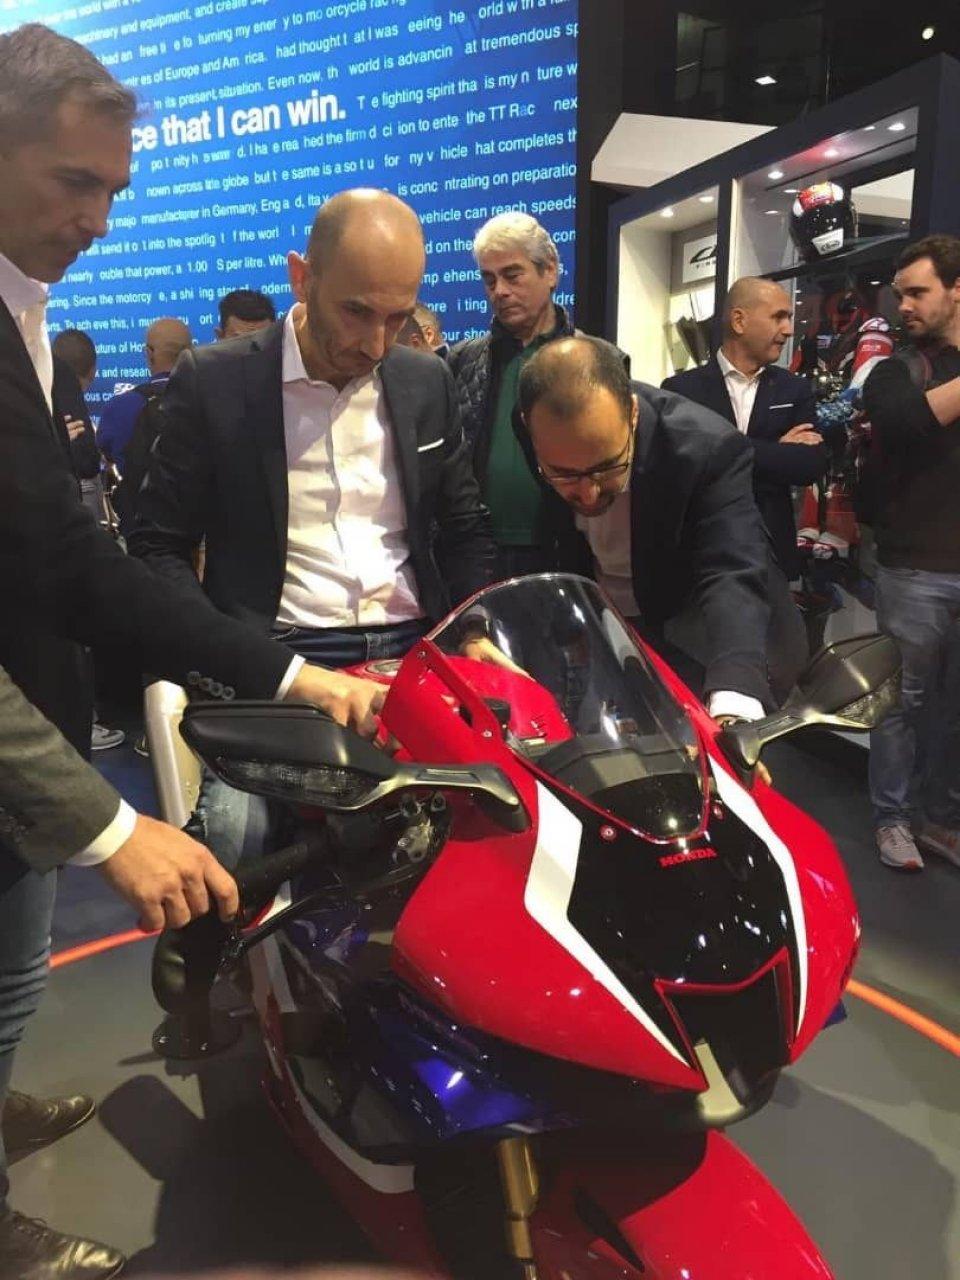 EICMA: Domenicali 'prova' la nuova Honda CBR 1000 RR-R ad Eicma